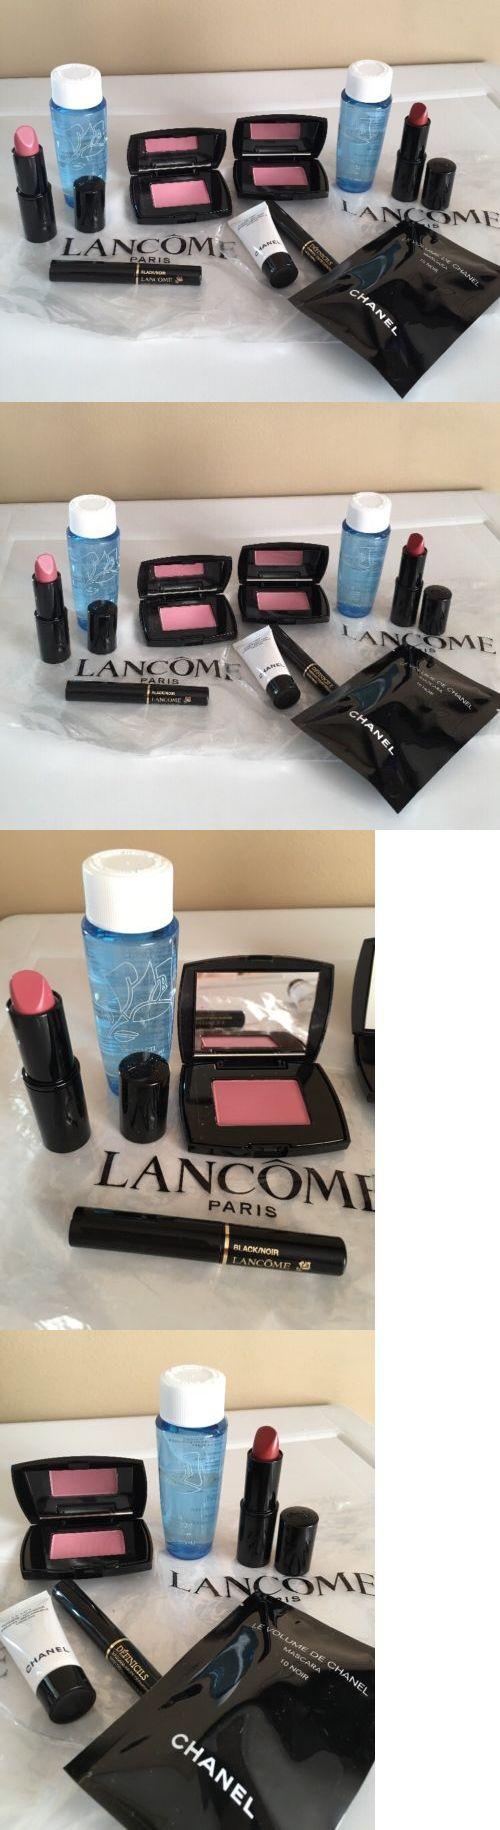 wholesale Makeup: Lancôme Cosmetics Lipstick Makeup Remove Mascara Gift BUY IT NOW ONLY: $30.0